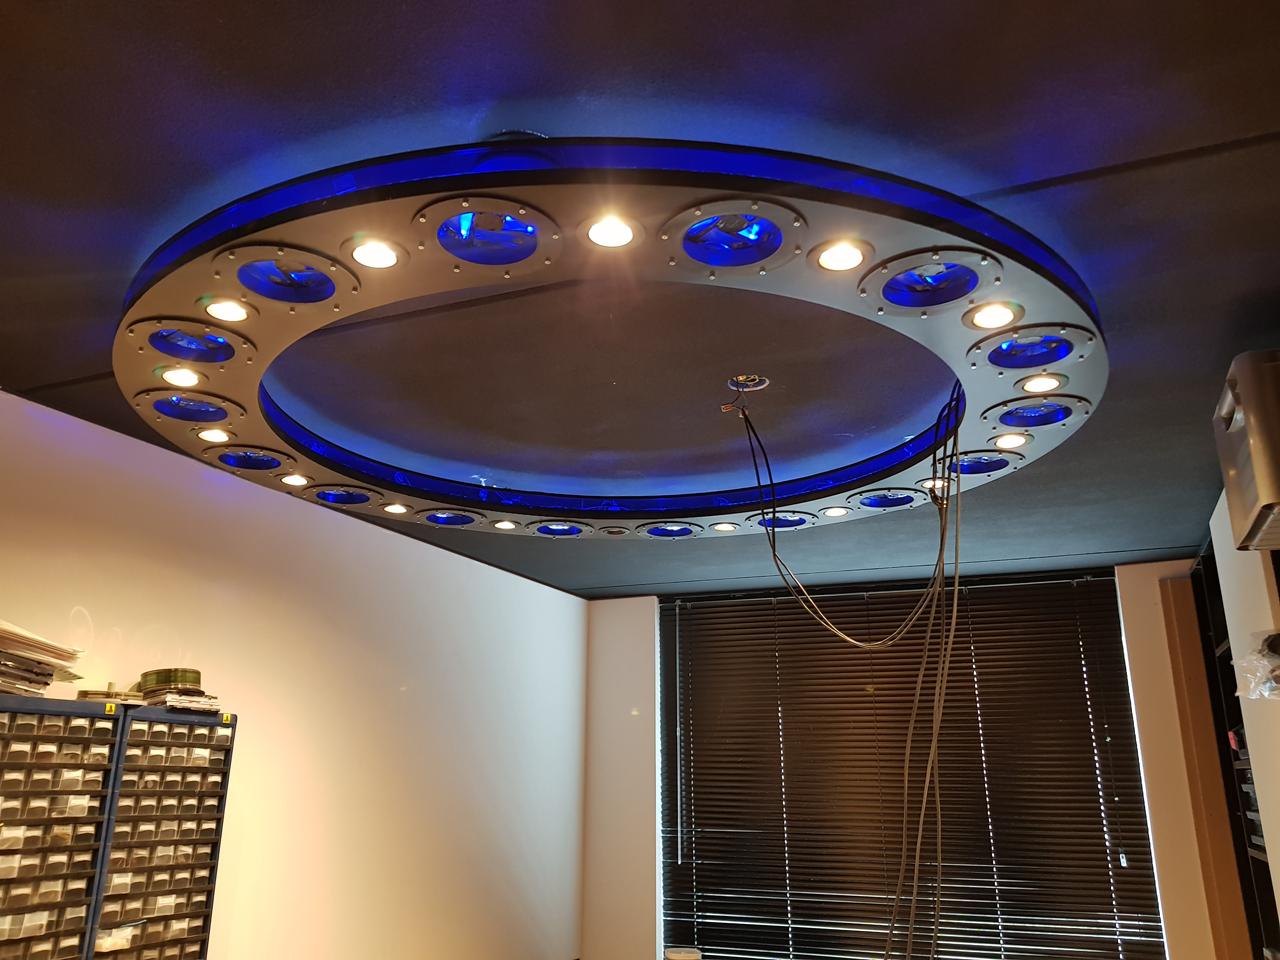 https://lumatronix.nl/FOK/Space_lamp1.jpg